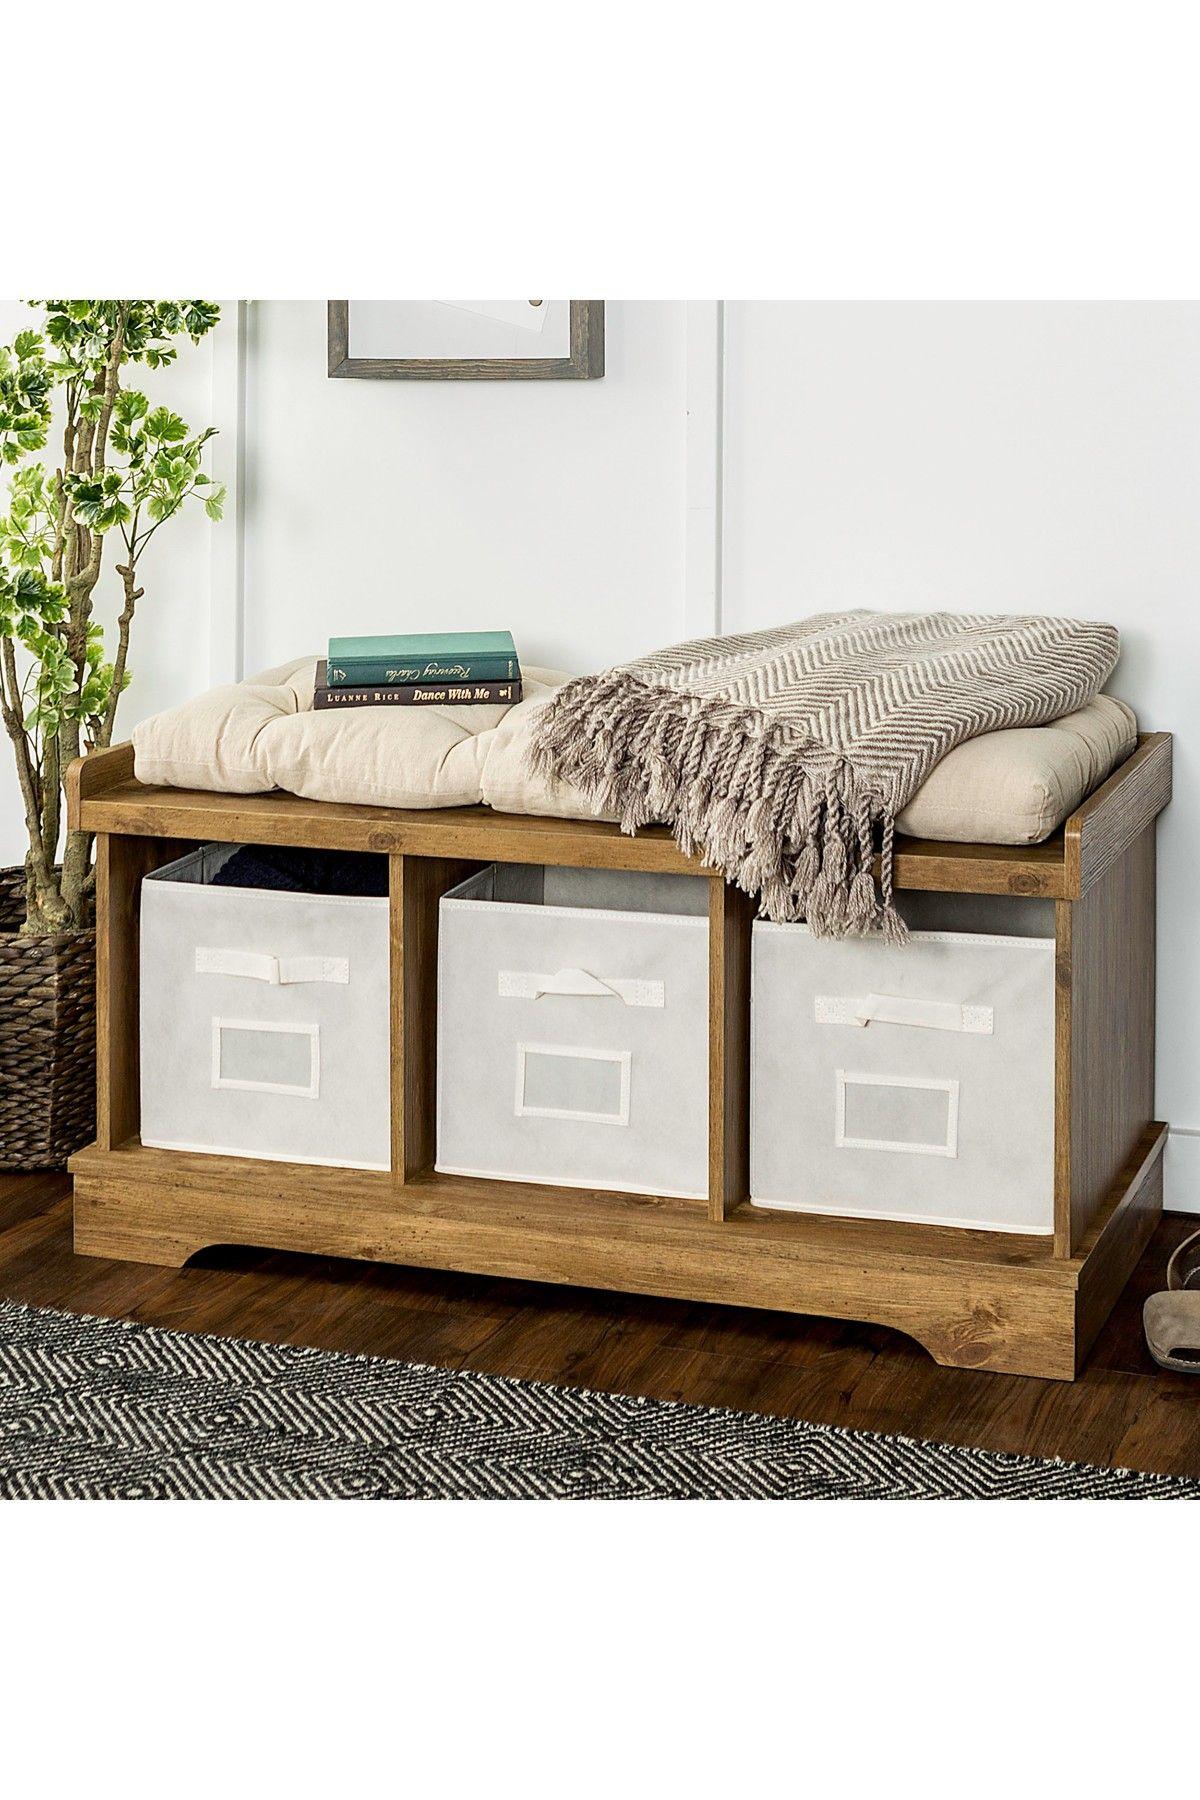 "Walker Edison Furniture pany 42"" Wood Barnwood Storage Bench"